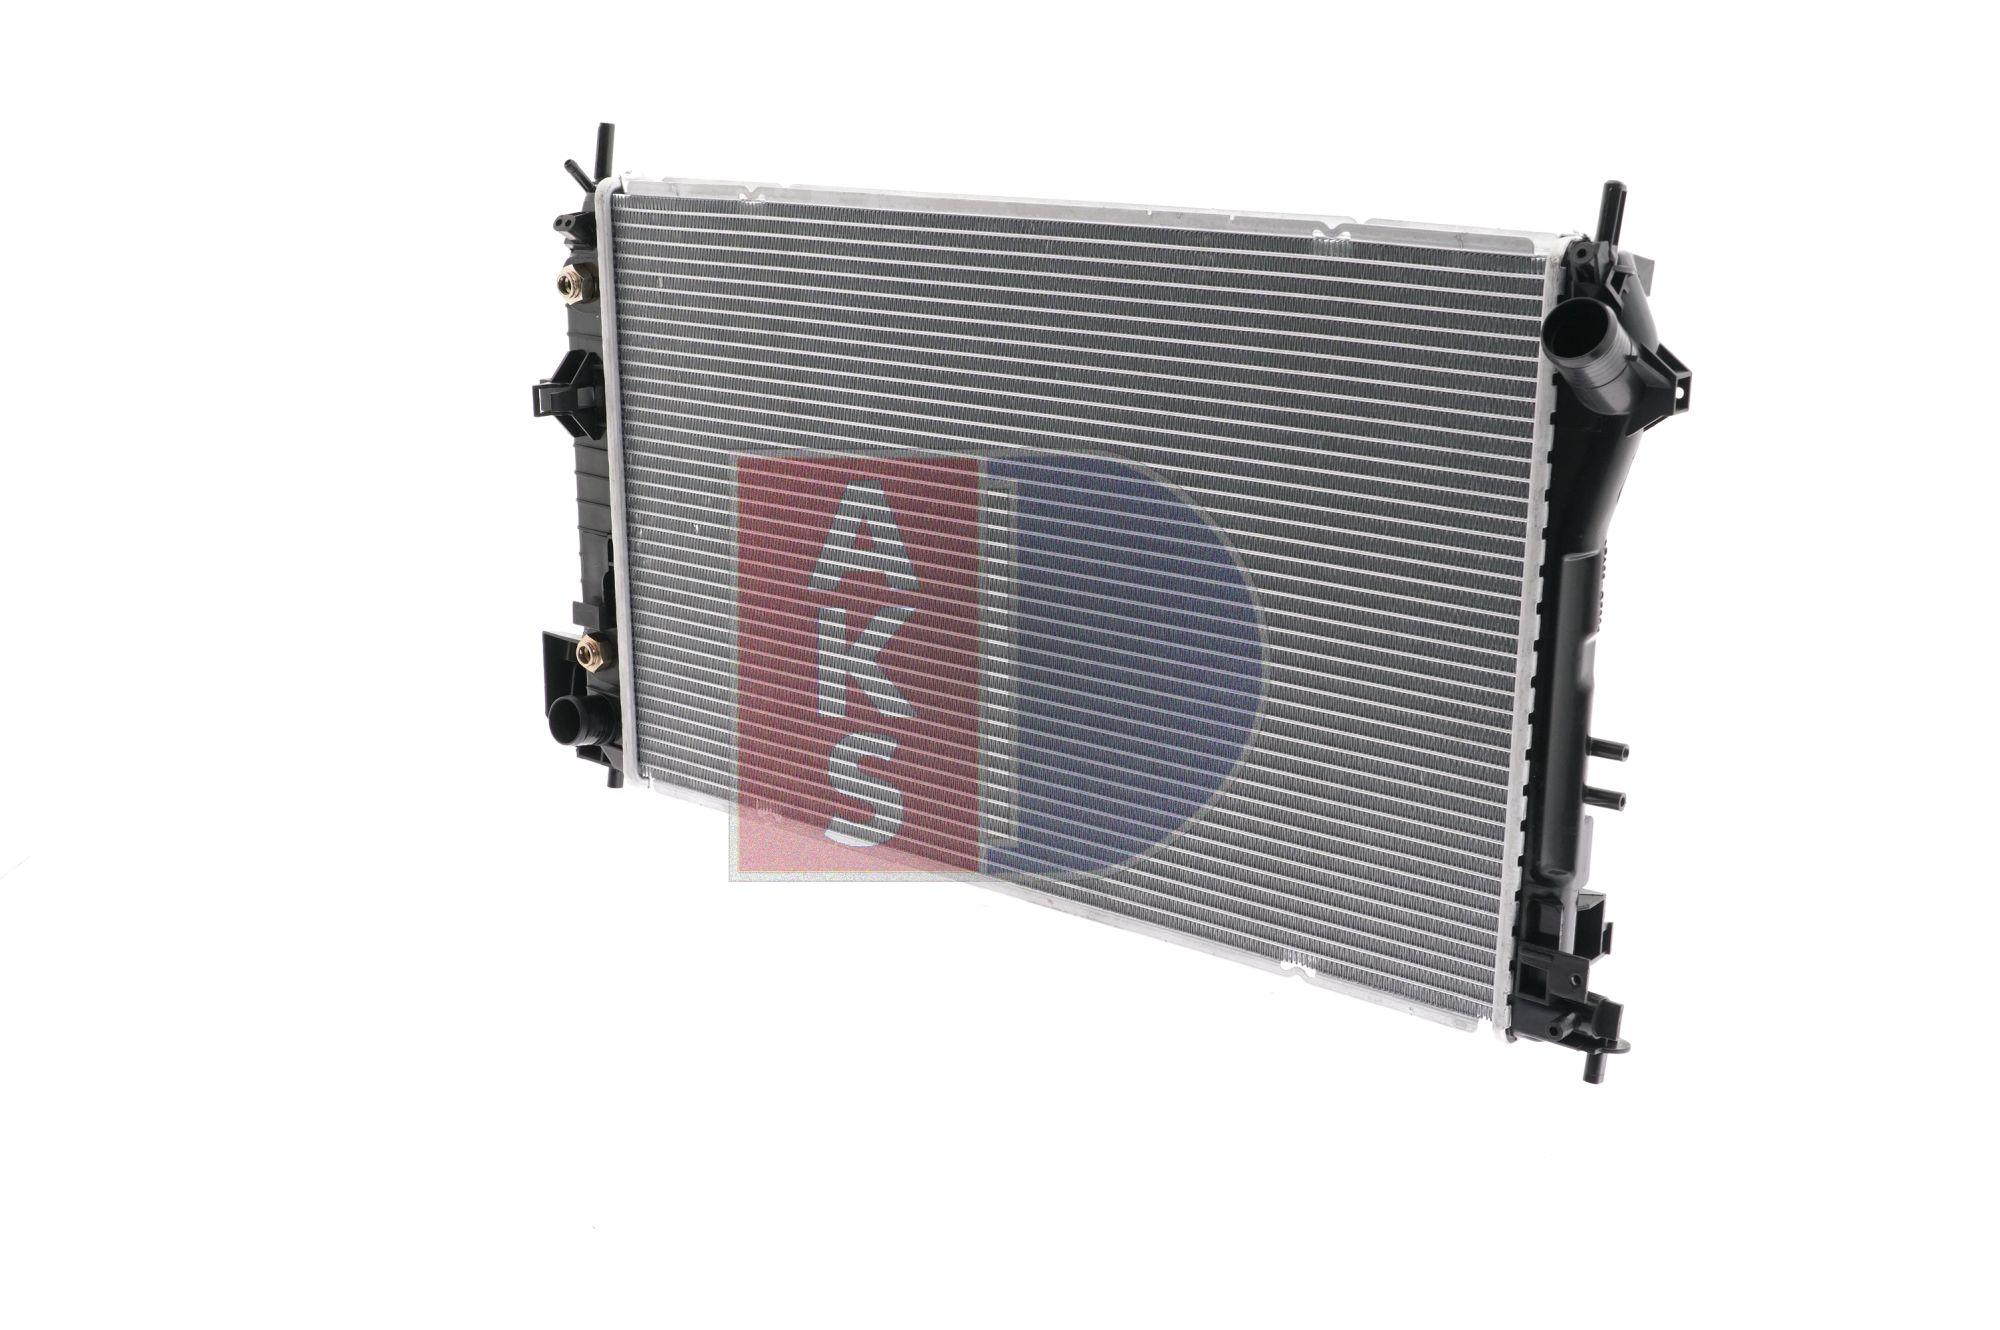 AKS DASIS Radiatore motore SAAB Alette di raffreddamento saldate